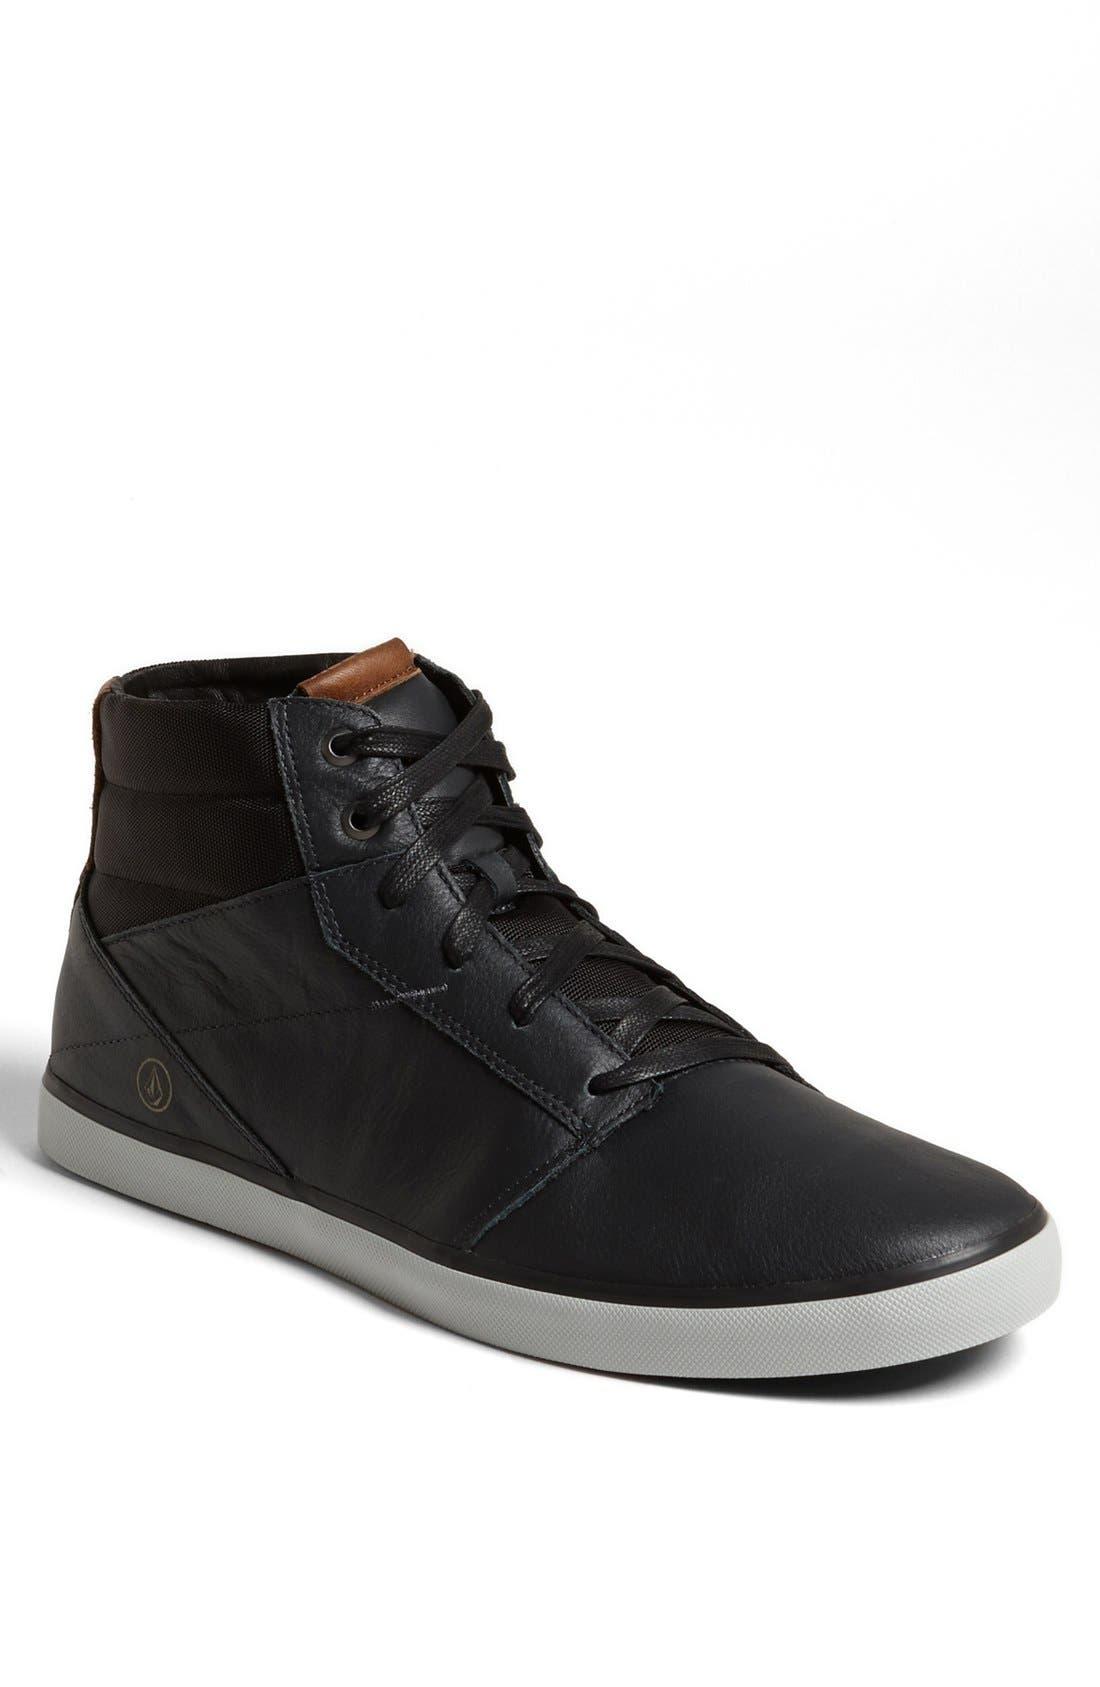 Alternate Image 1 Selected - Volcom 'Grimm' High Top Sneaker